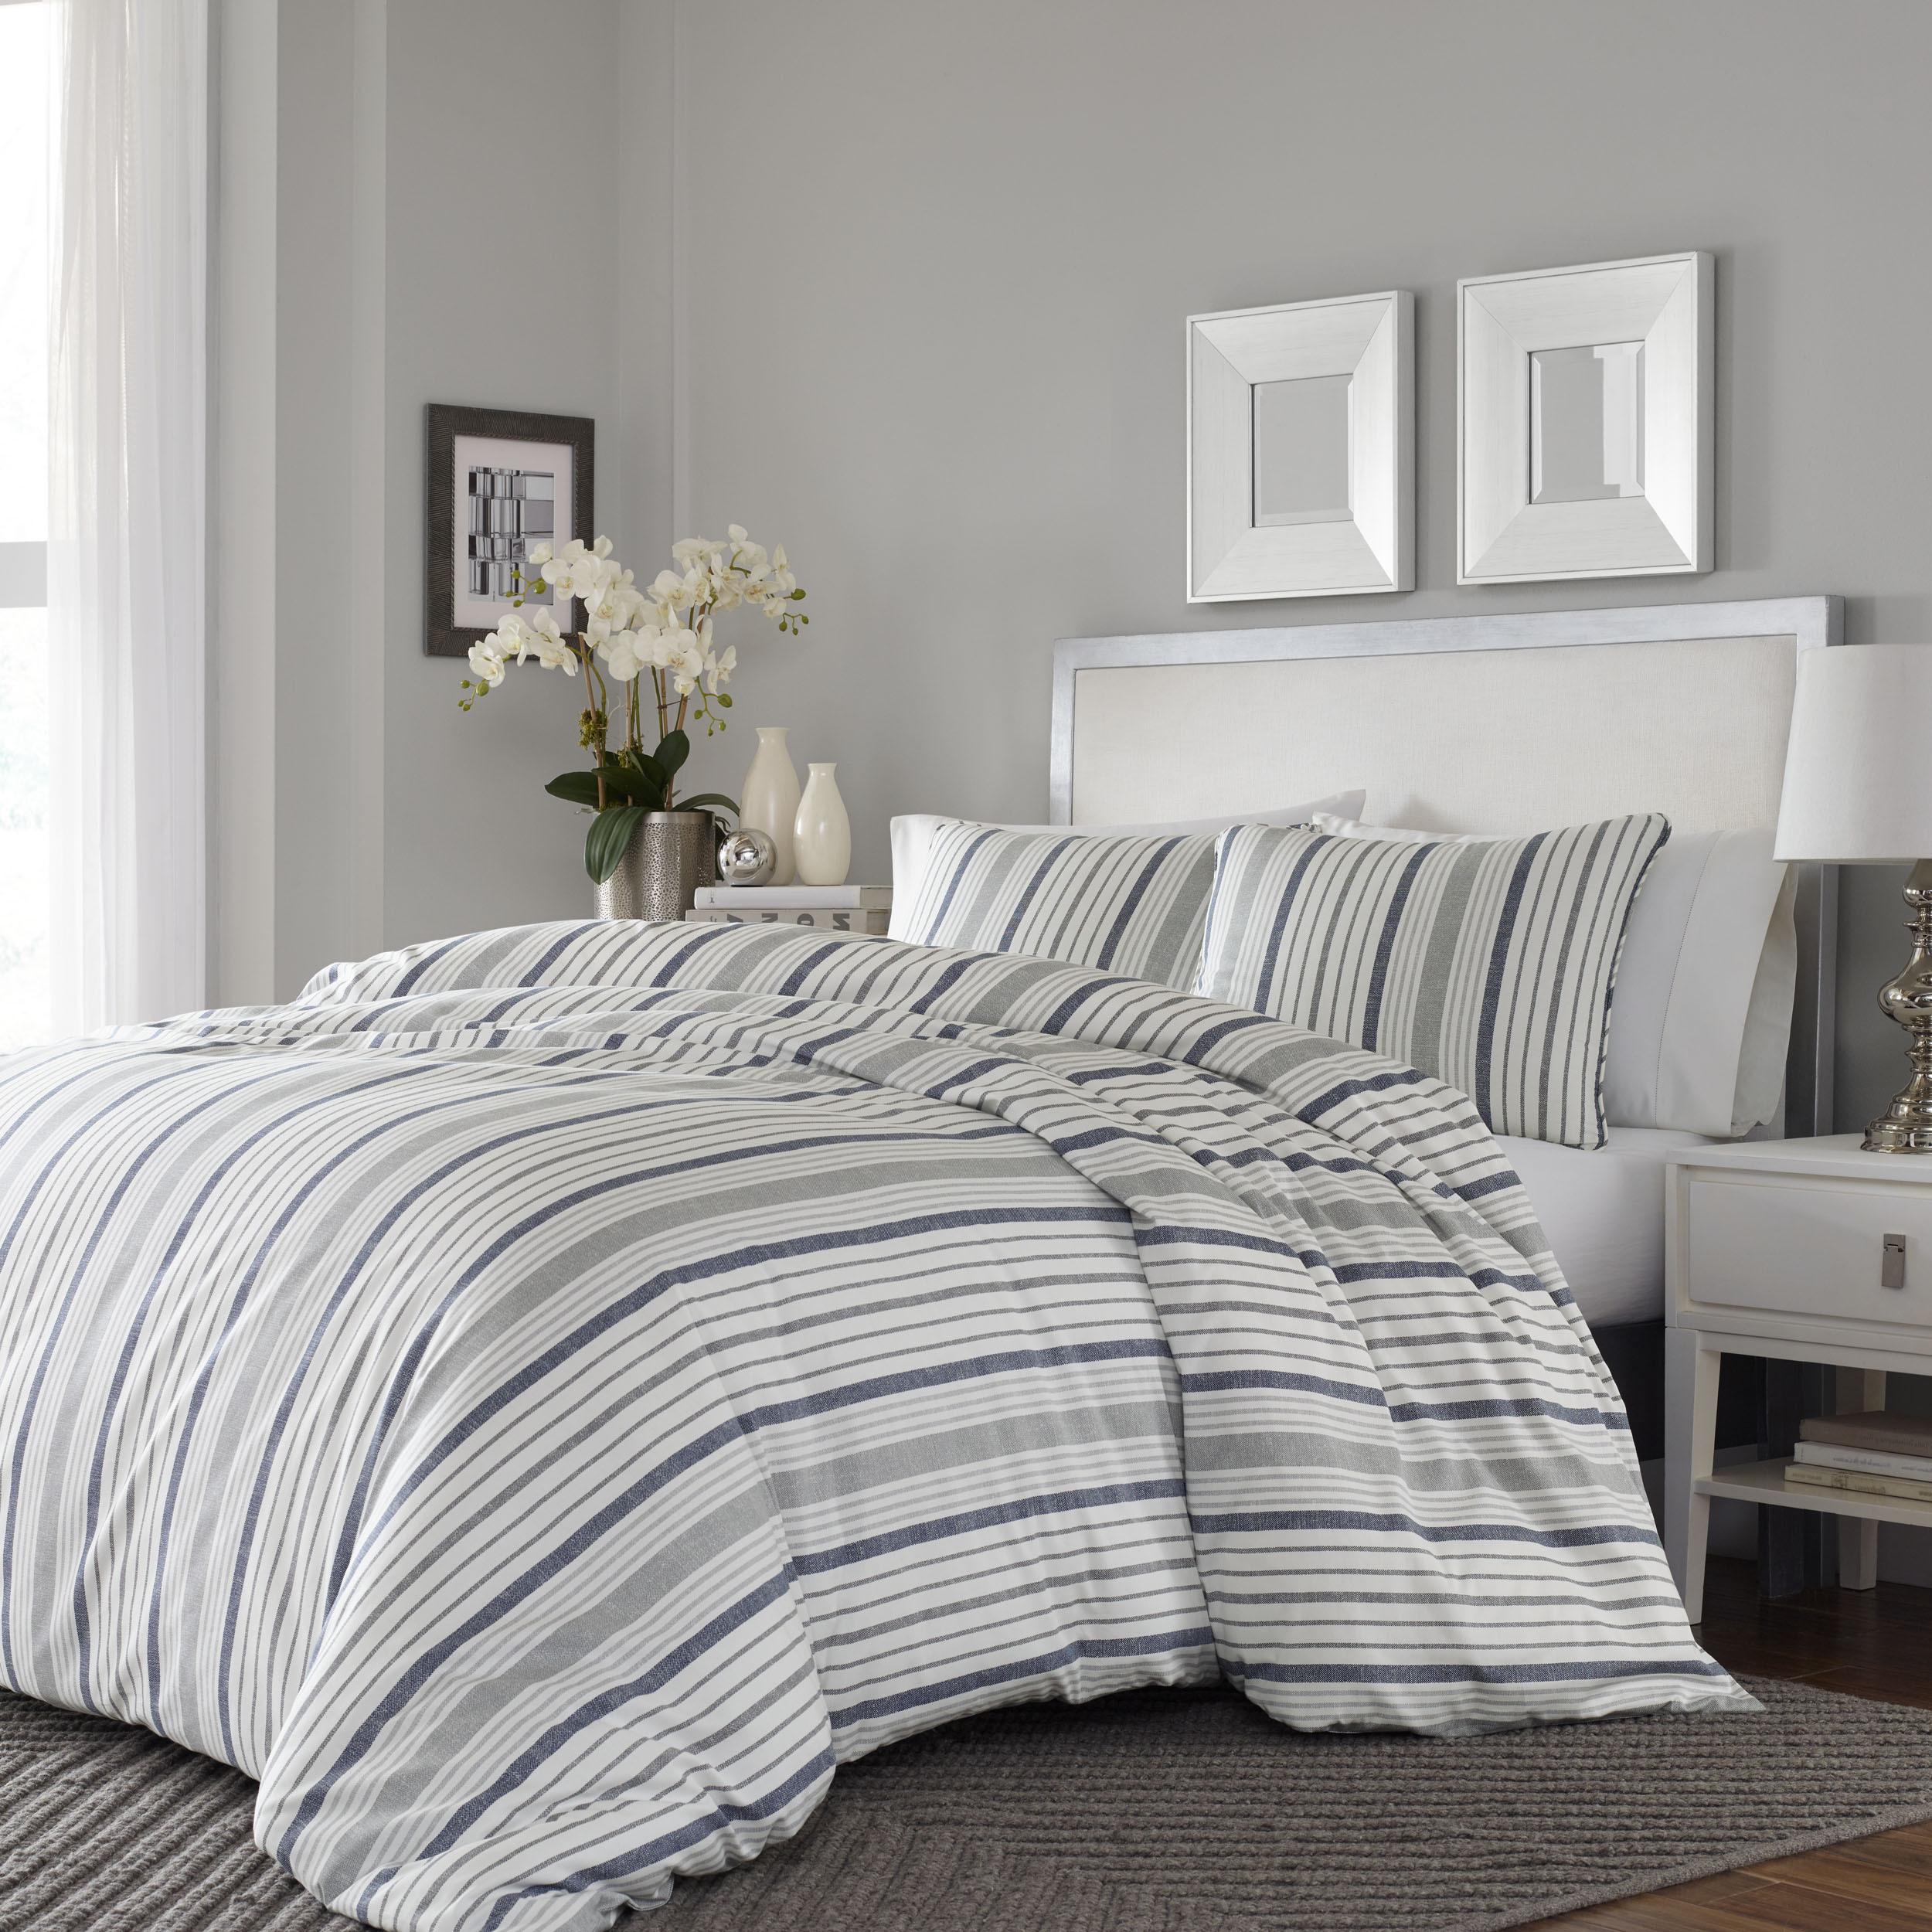 mount bed com mini queen comforter camo remington full set bedding monadnock overstock